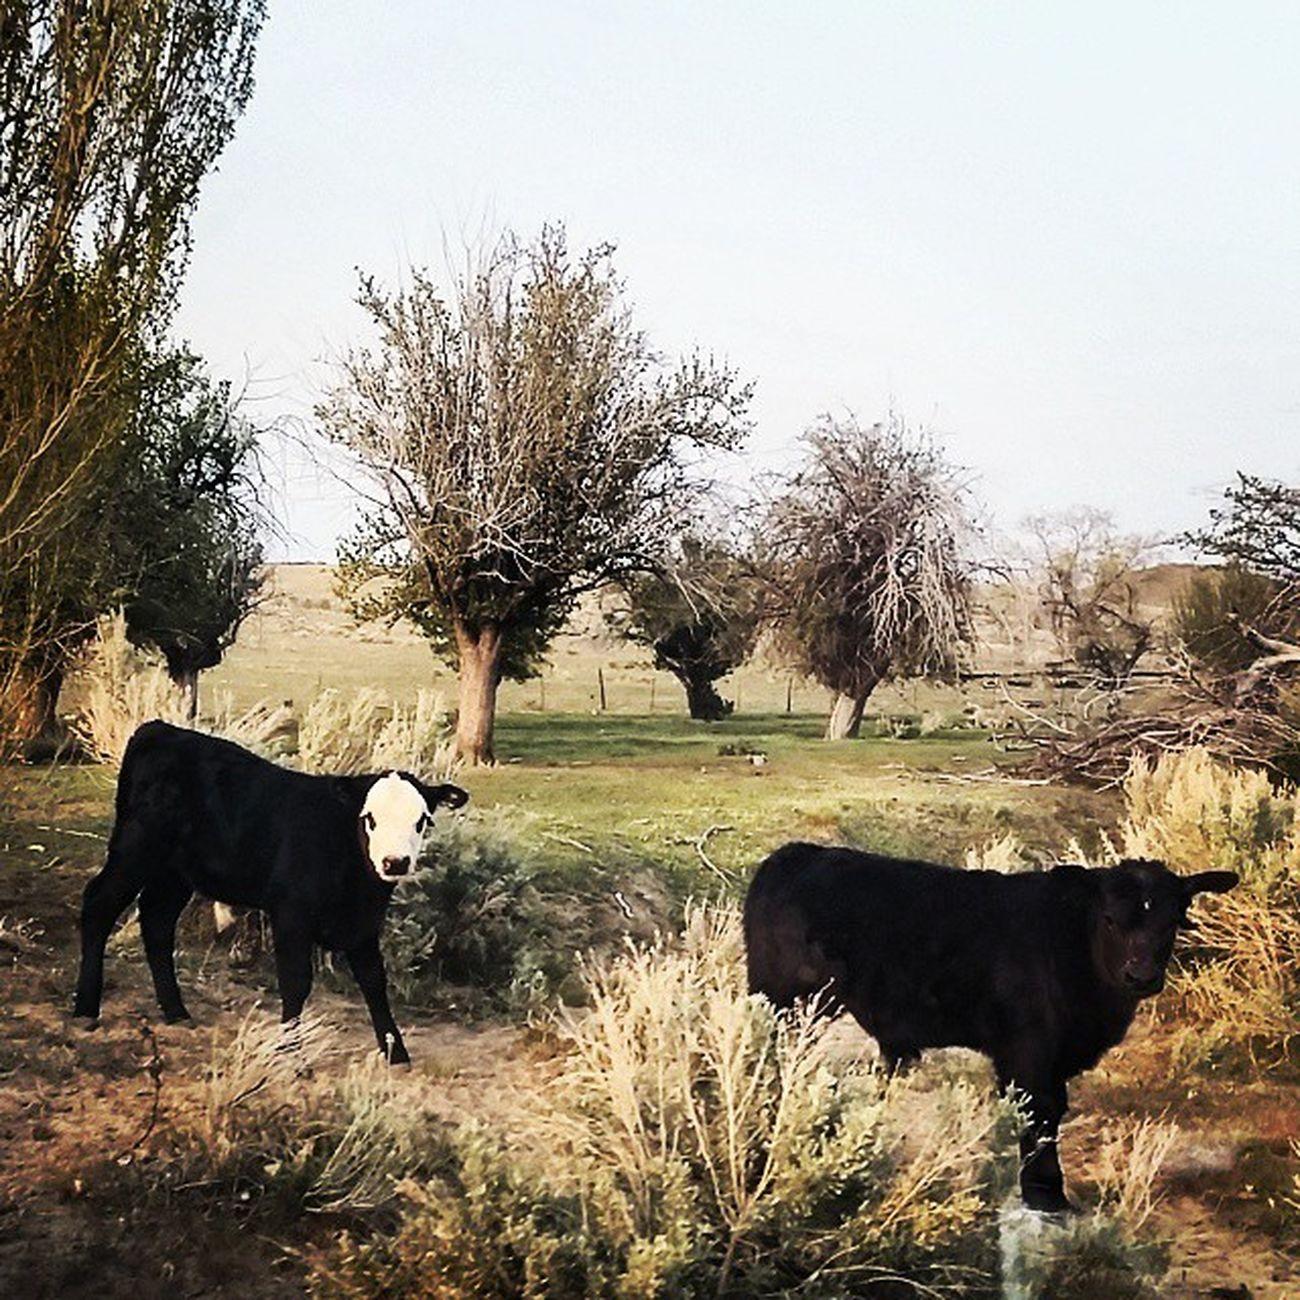 Nevada Northennevada Beef Funinthesun  Caves America Desertlove Desertlife Nextgenerationoflife Cattel Moo Beef